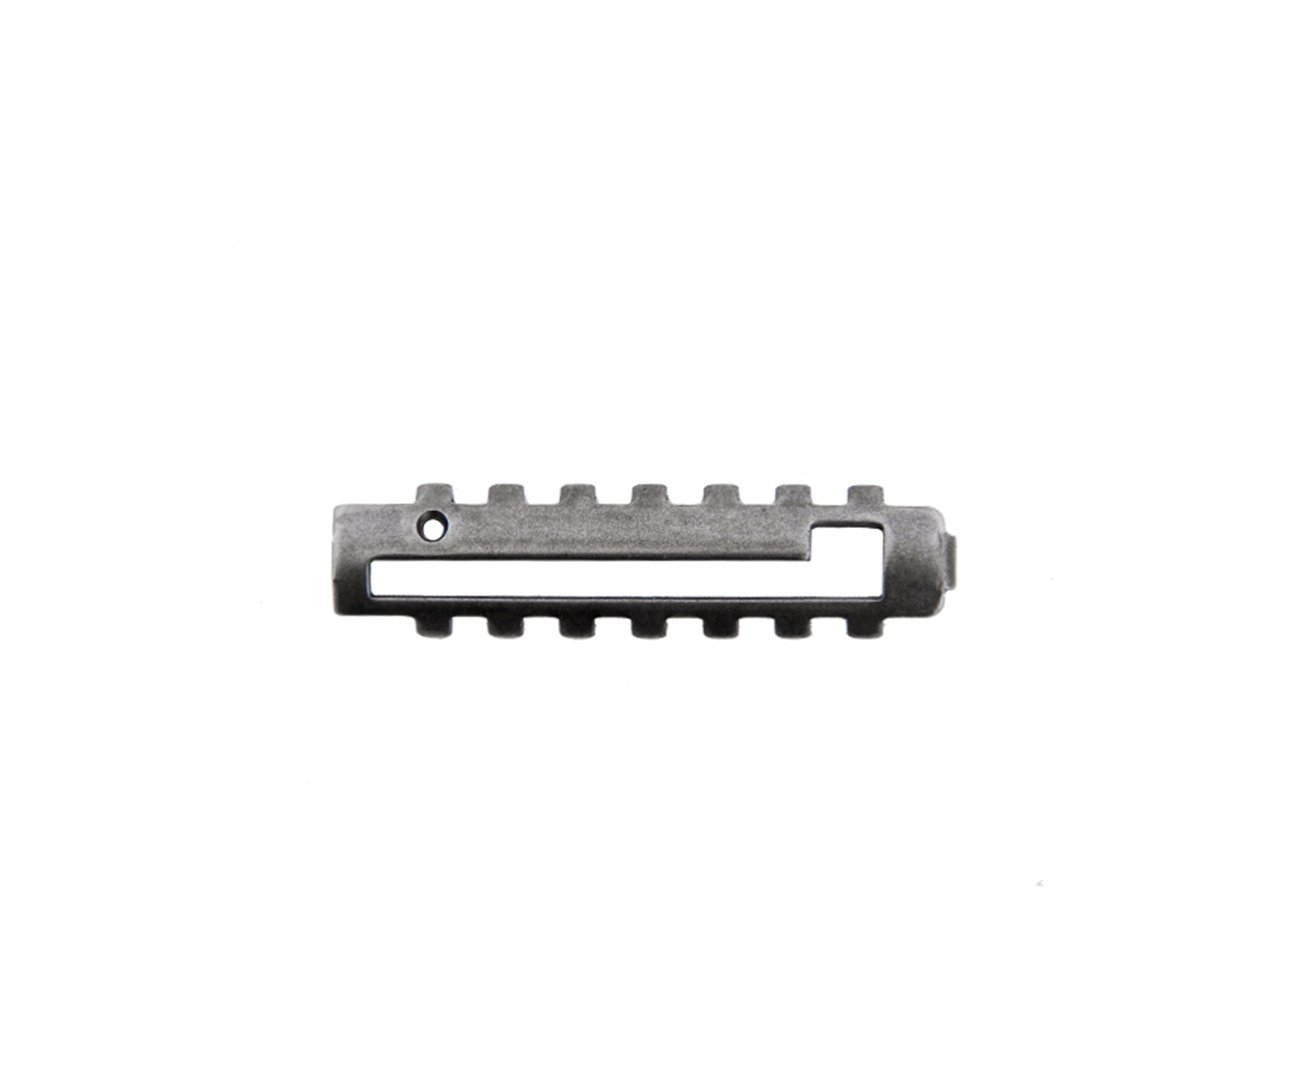 Pletina Do Embolo Pistola P900 Gamo